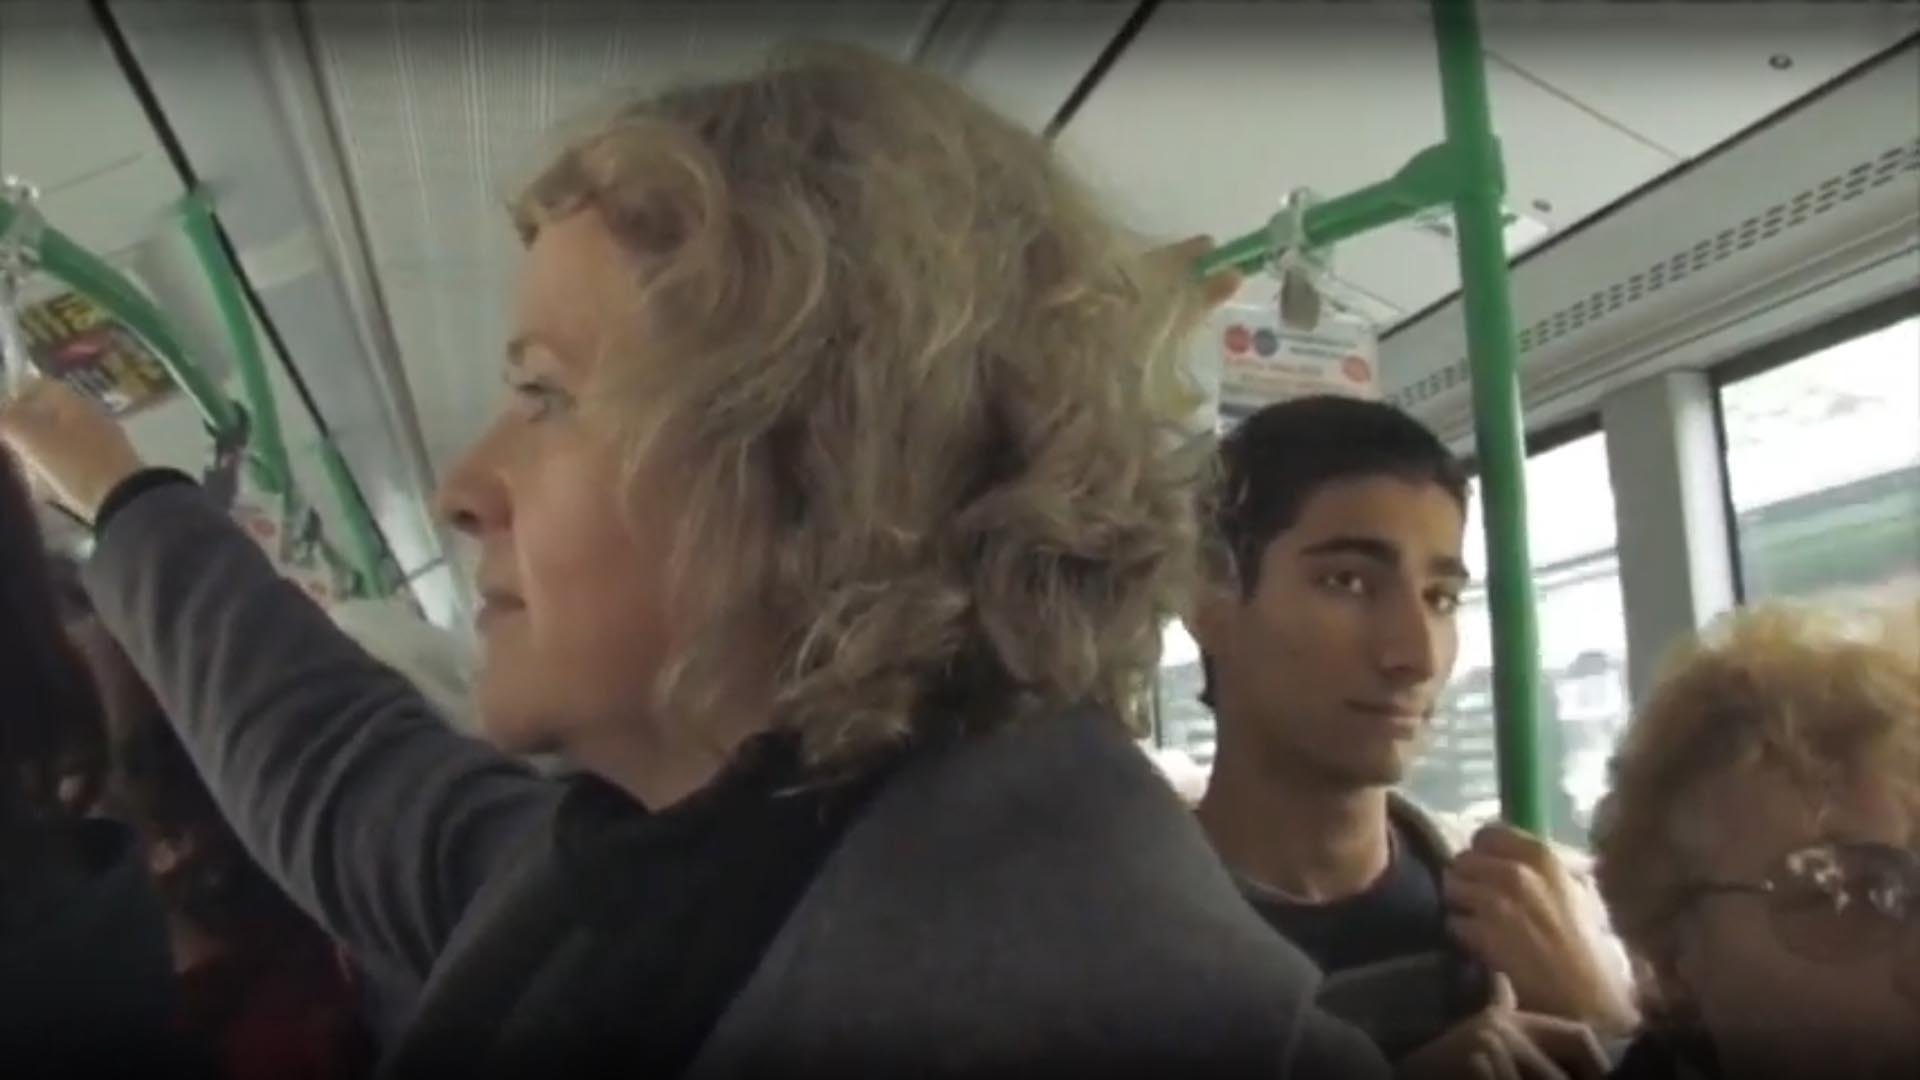 videostill fremd in istanbul